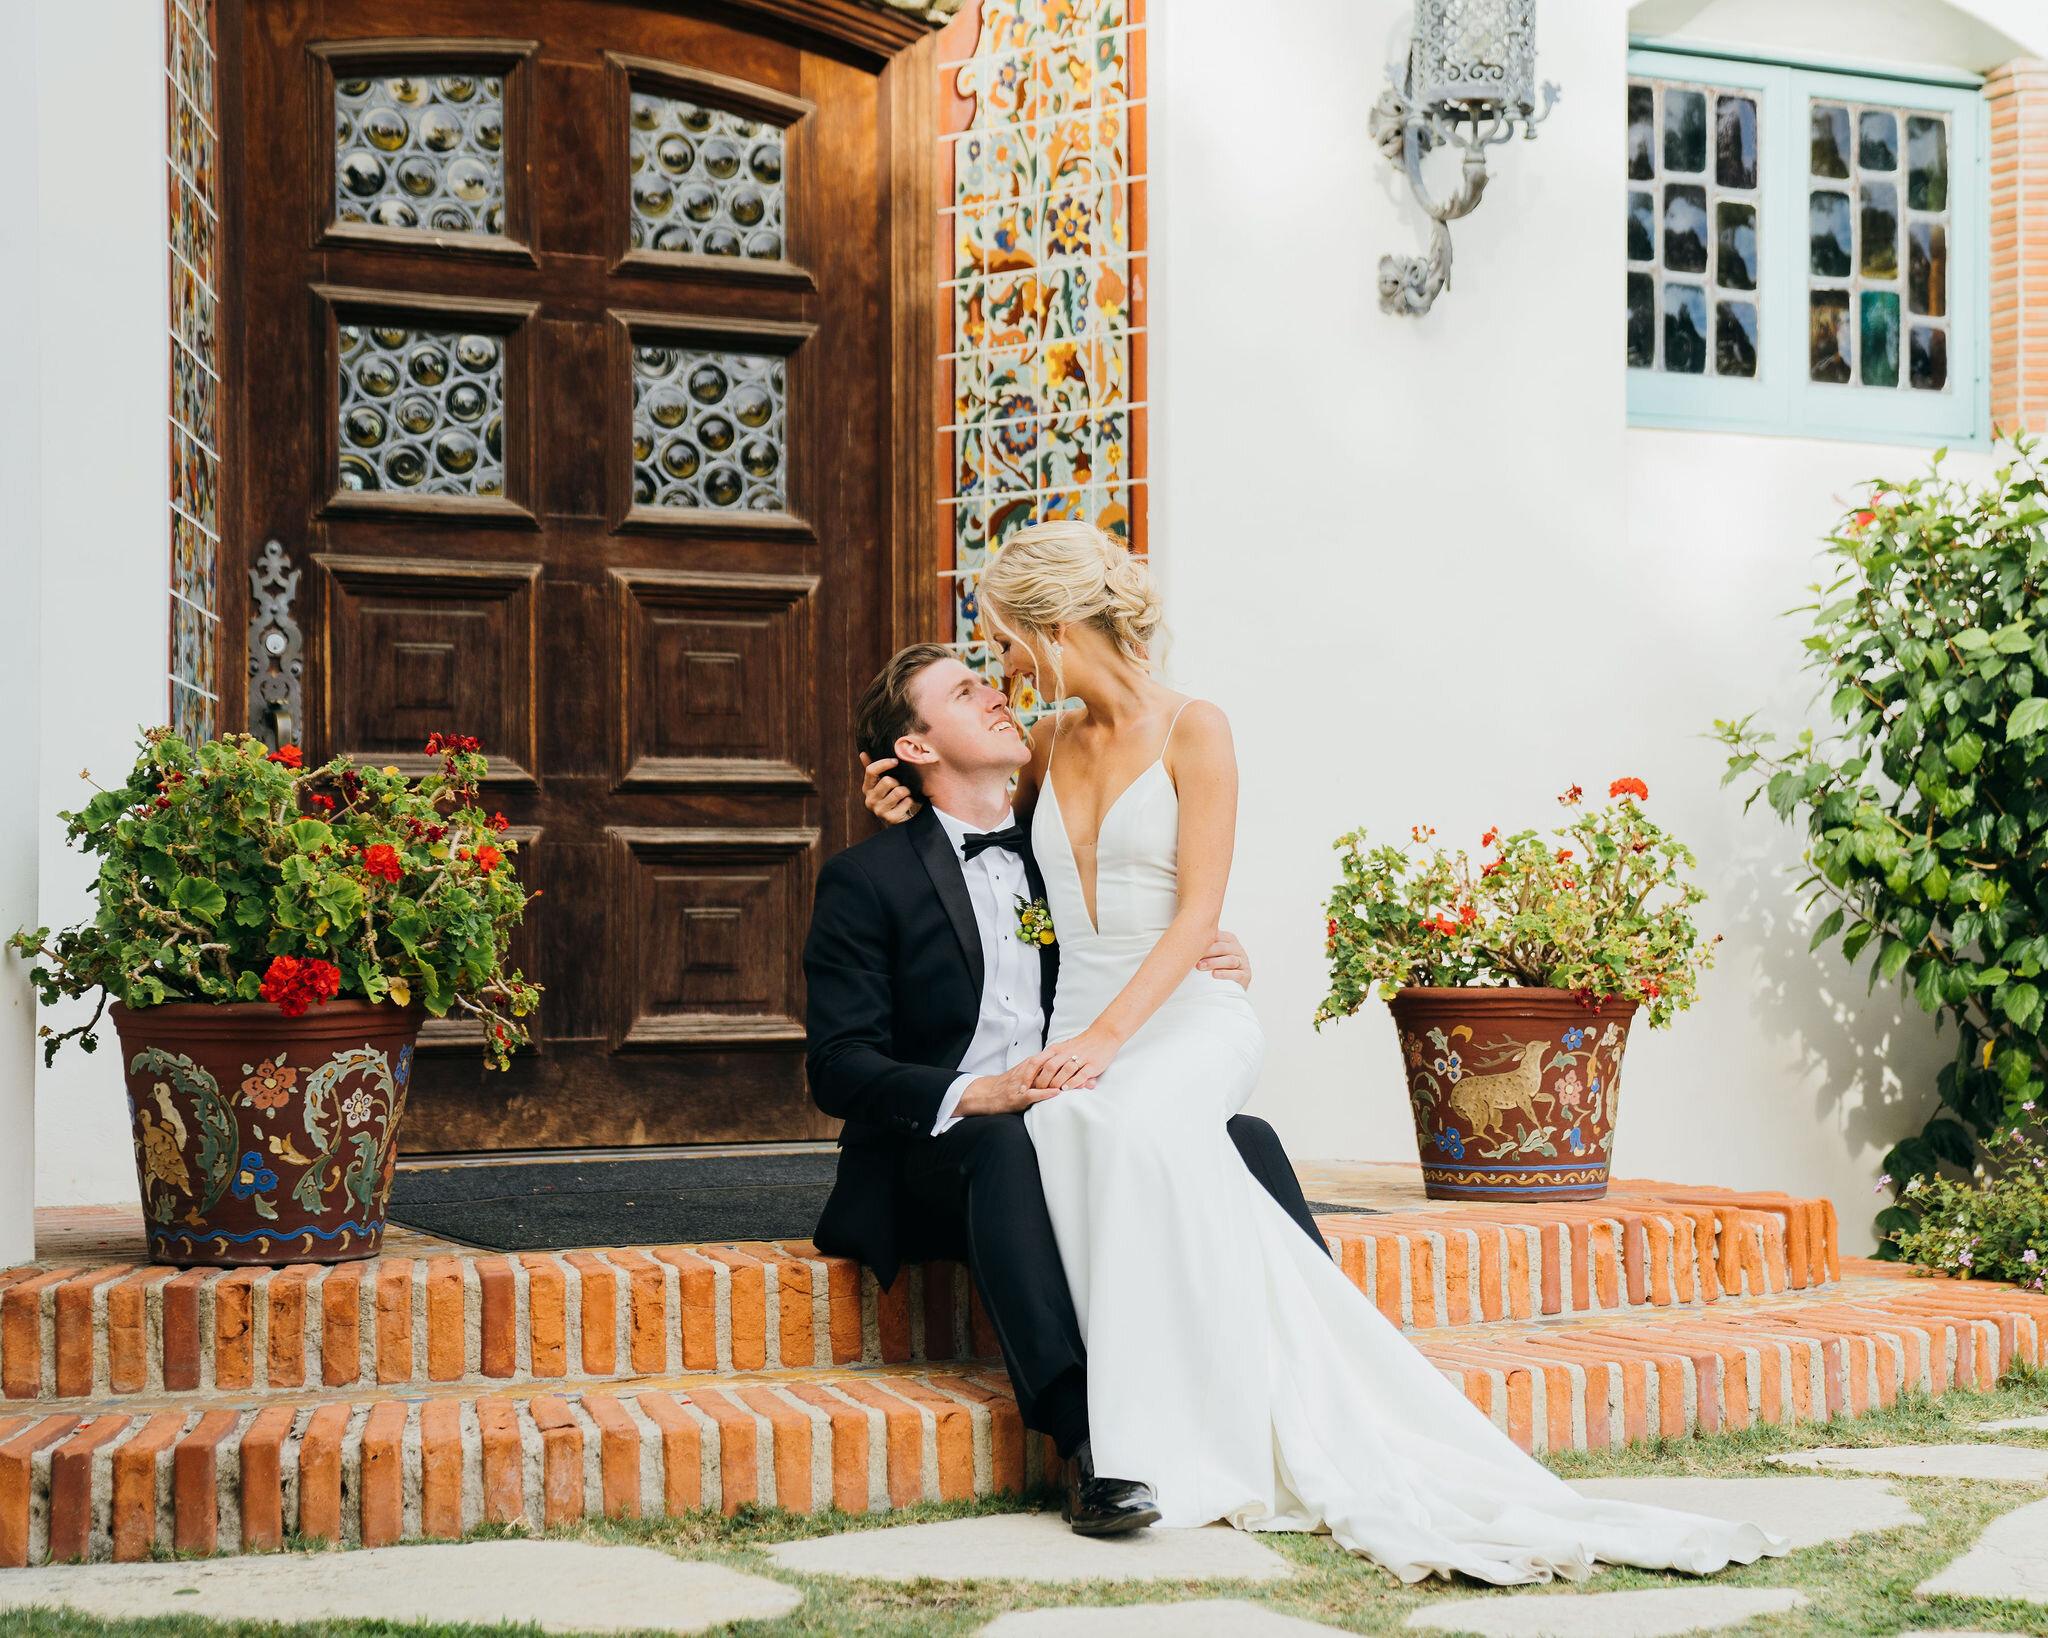 adamson-house-wedding-photography-141.jpg